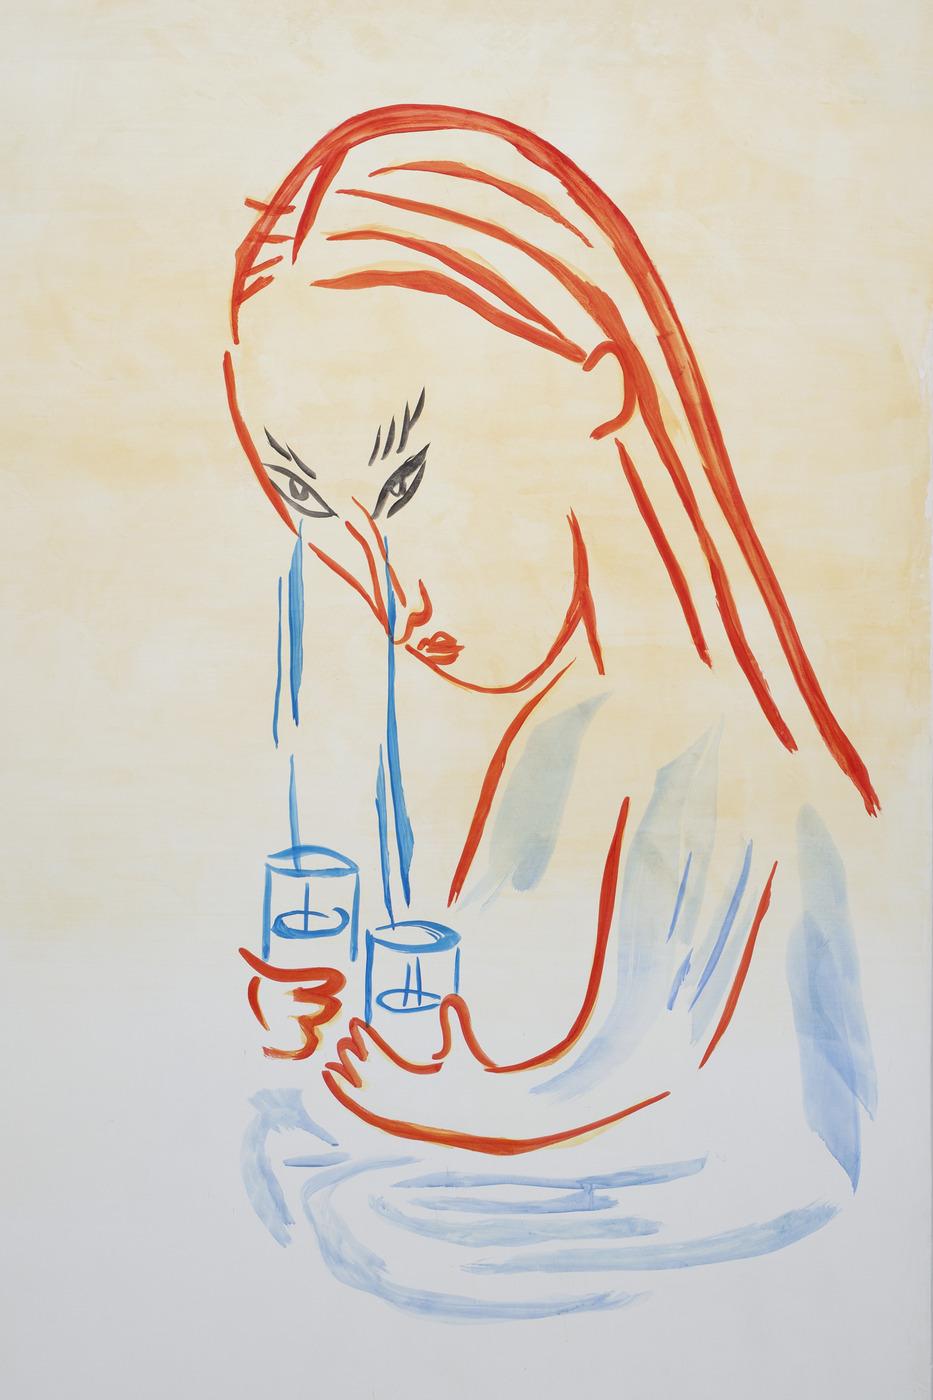 8. Camille Henrot, A Long Face, Fresco, detail, 2016